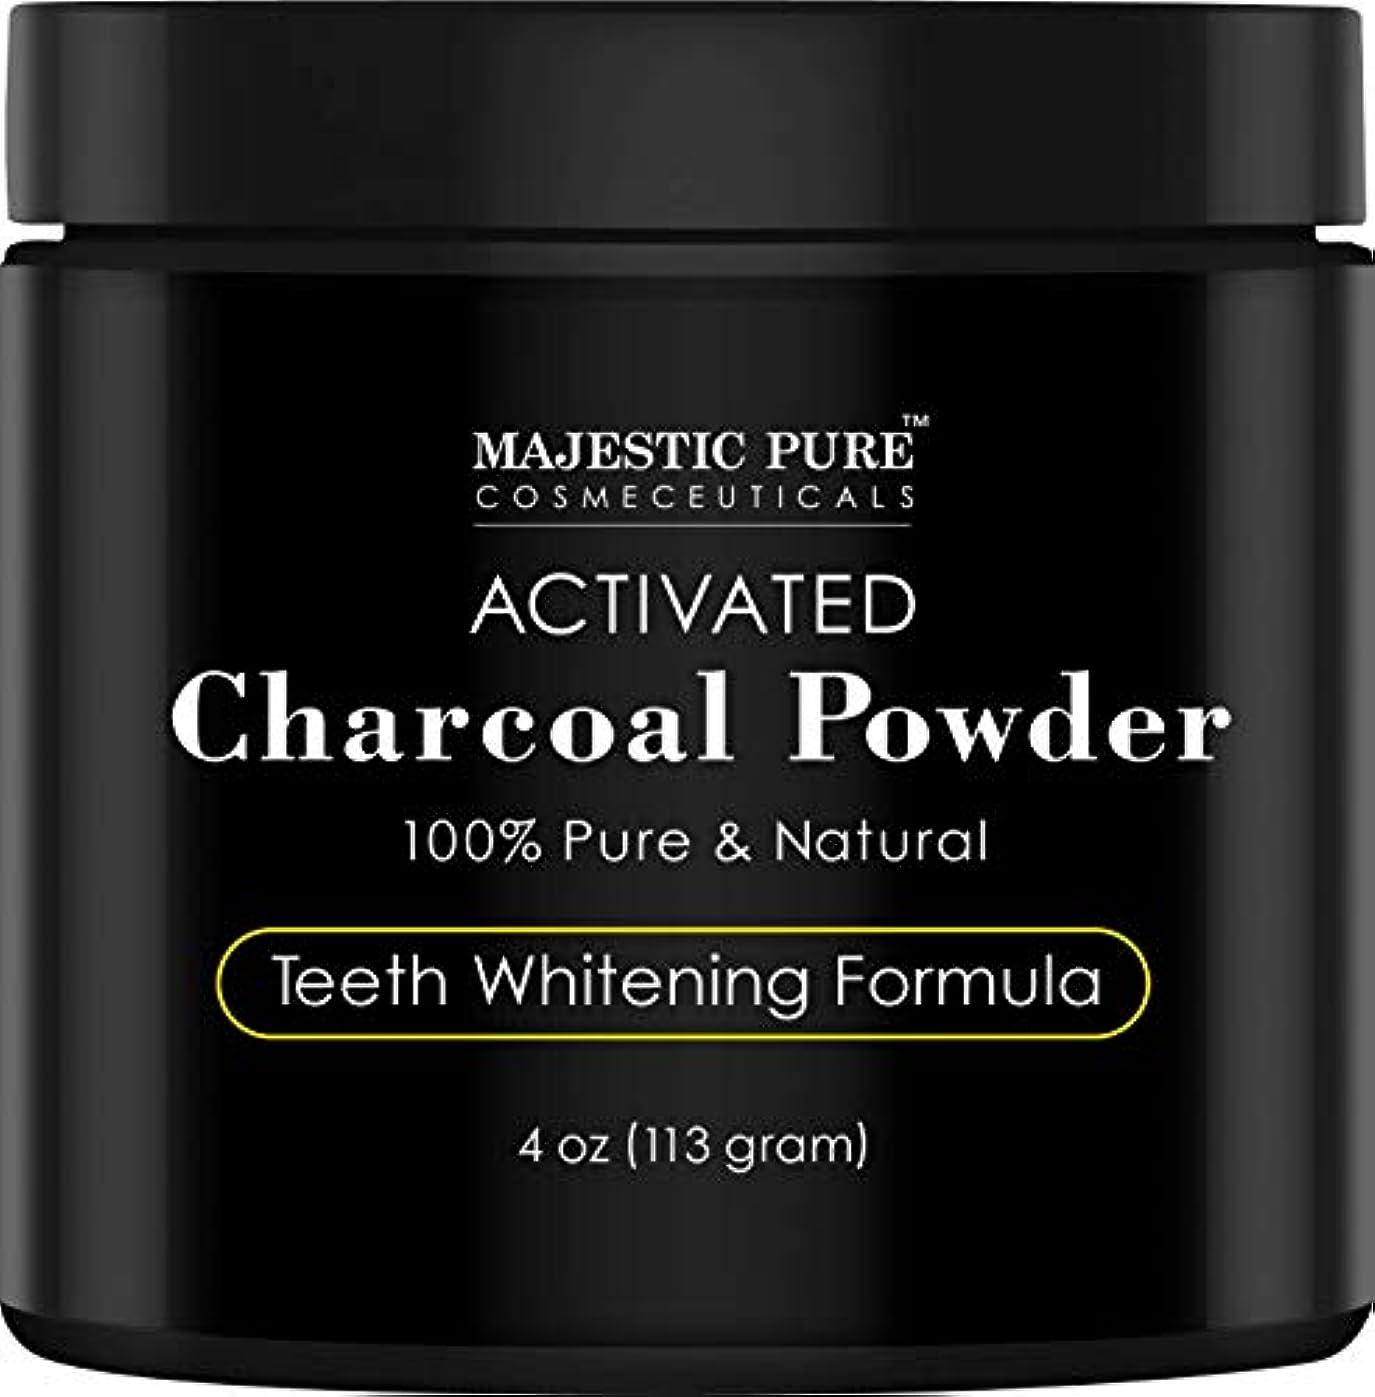 Majestic Pure Teeth Whitening Activated Charcoal Powder - Natural  歯のホワイトニング ココナッツ チャコールパウダー4 oz (113g)